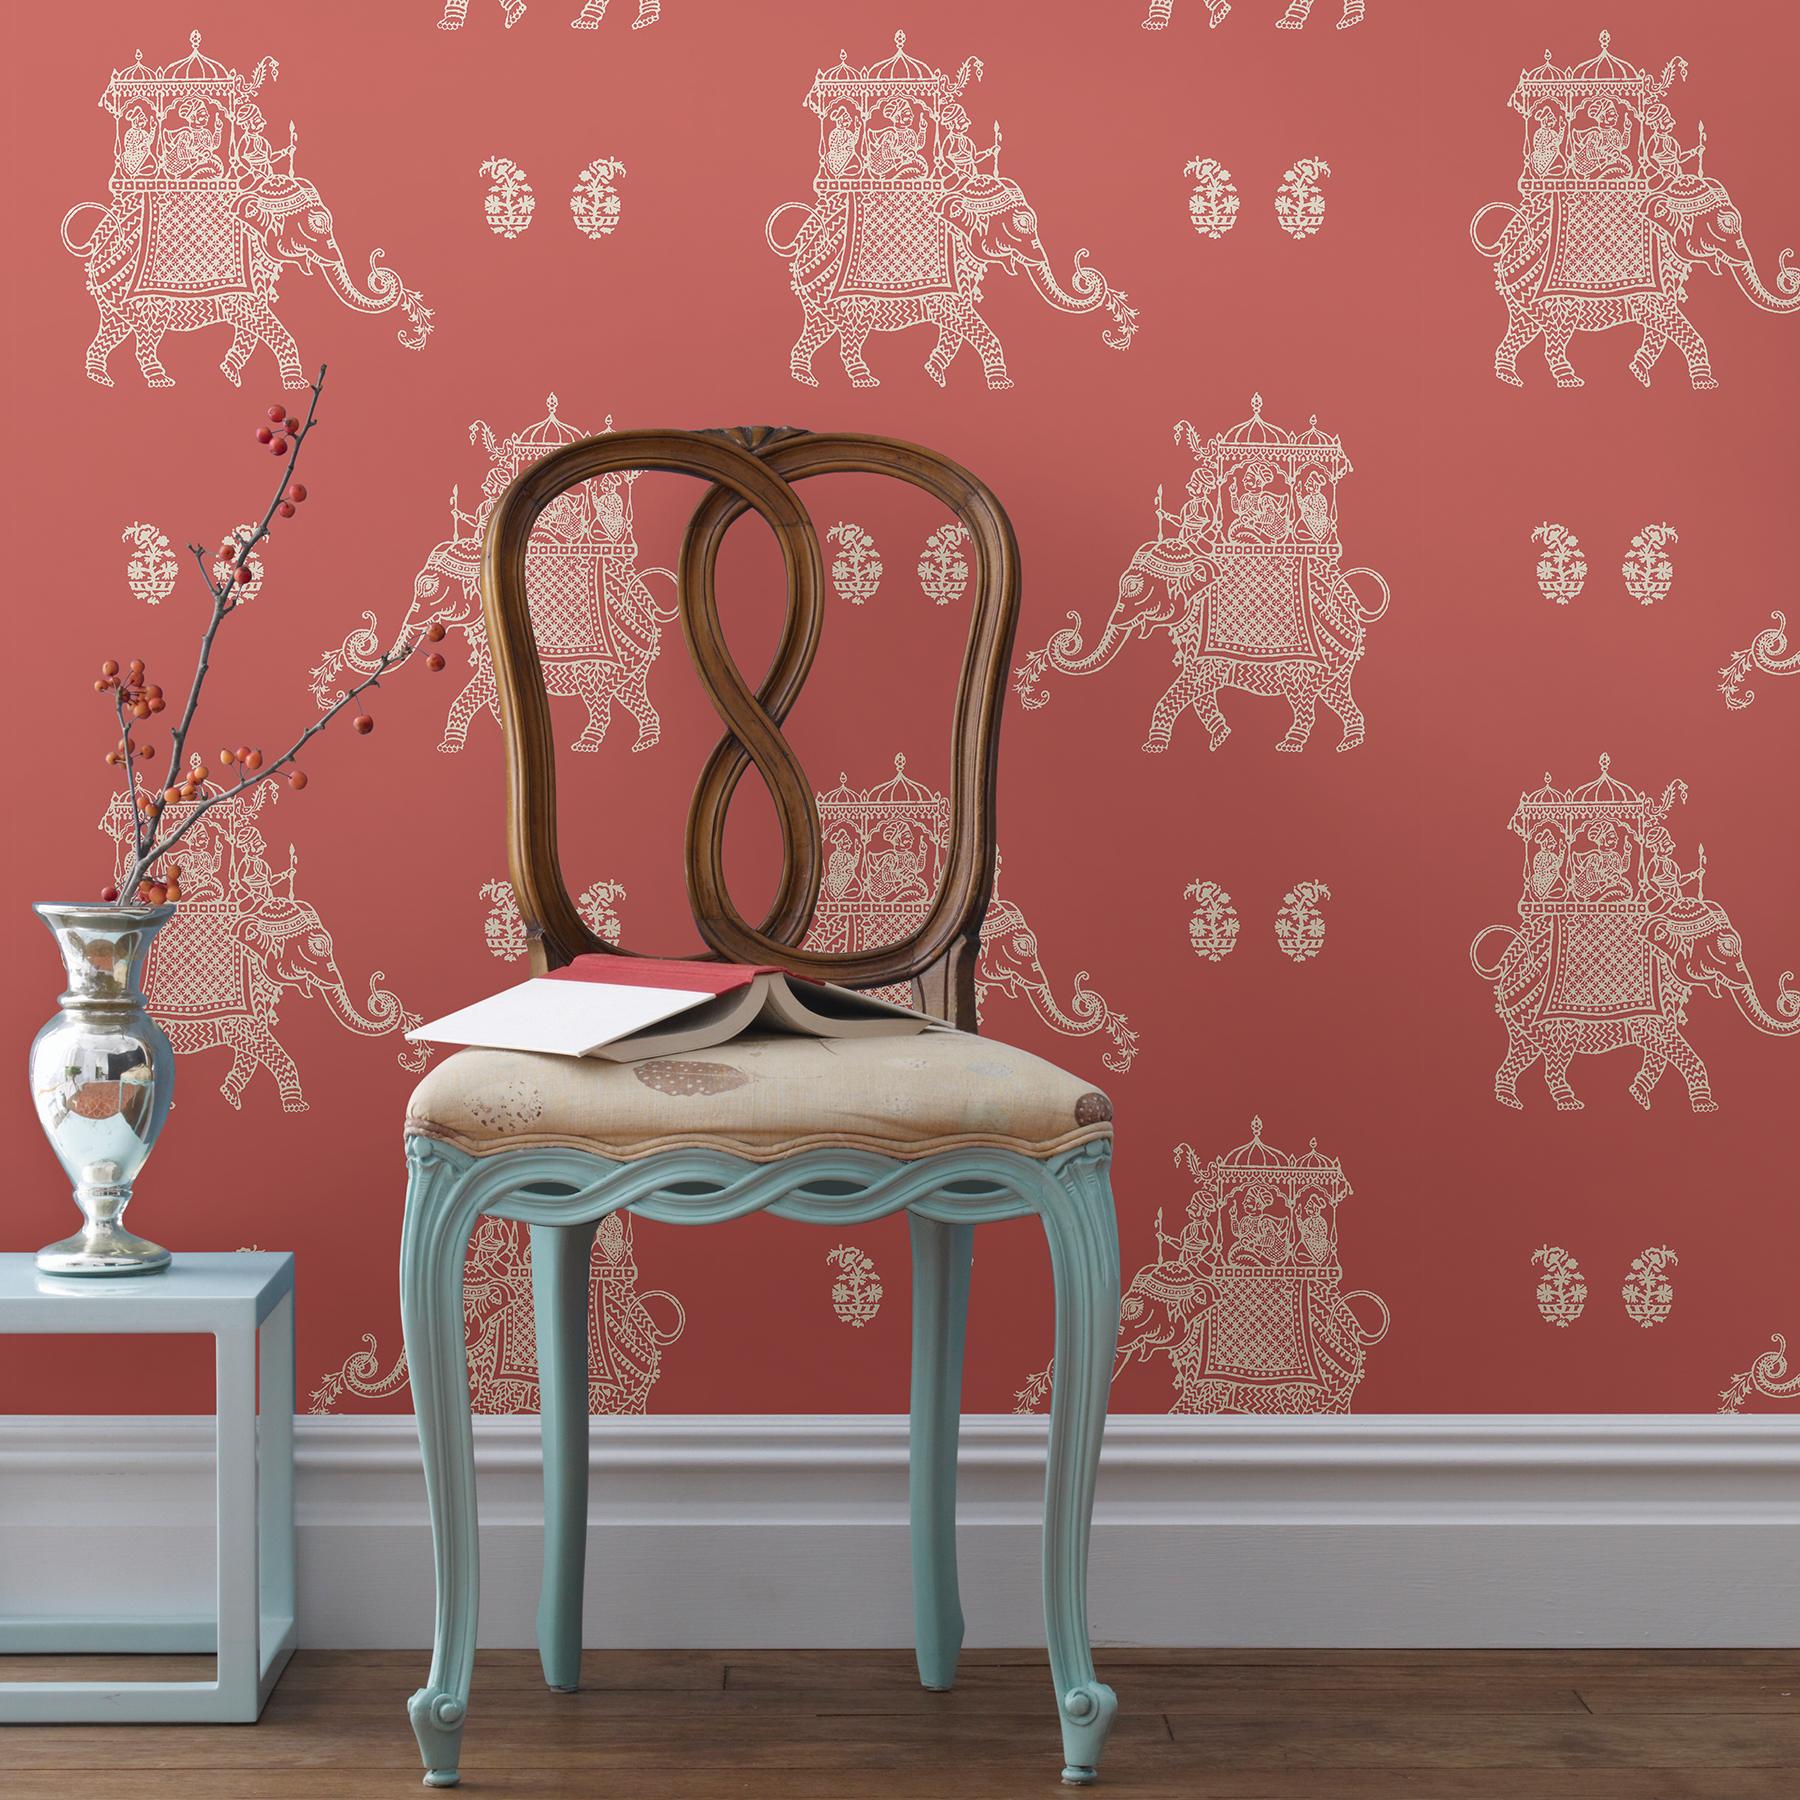 Nuwallpaper By Brewster Nuw2078 Caravan Coral Elephant Peel Stick Wallpaper The Savvy Decorator